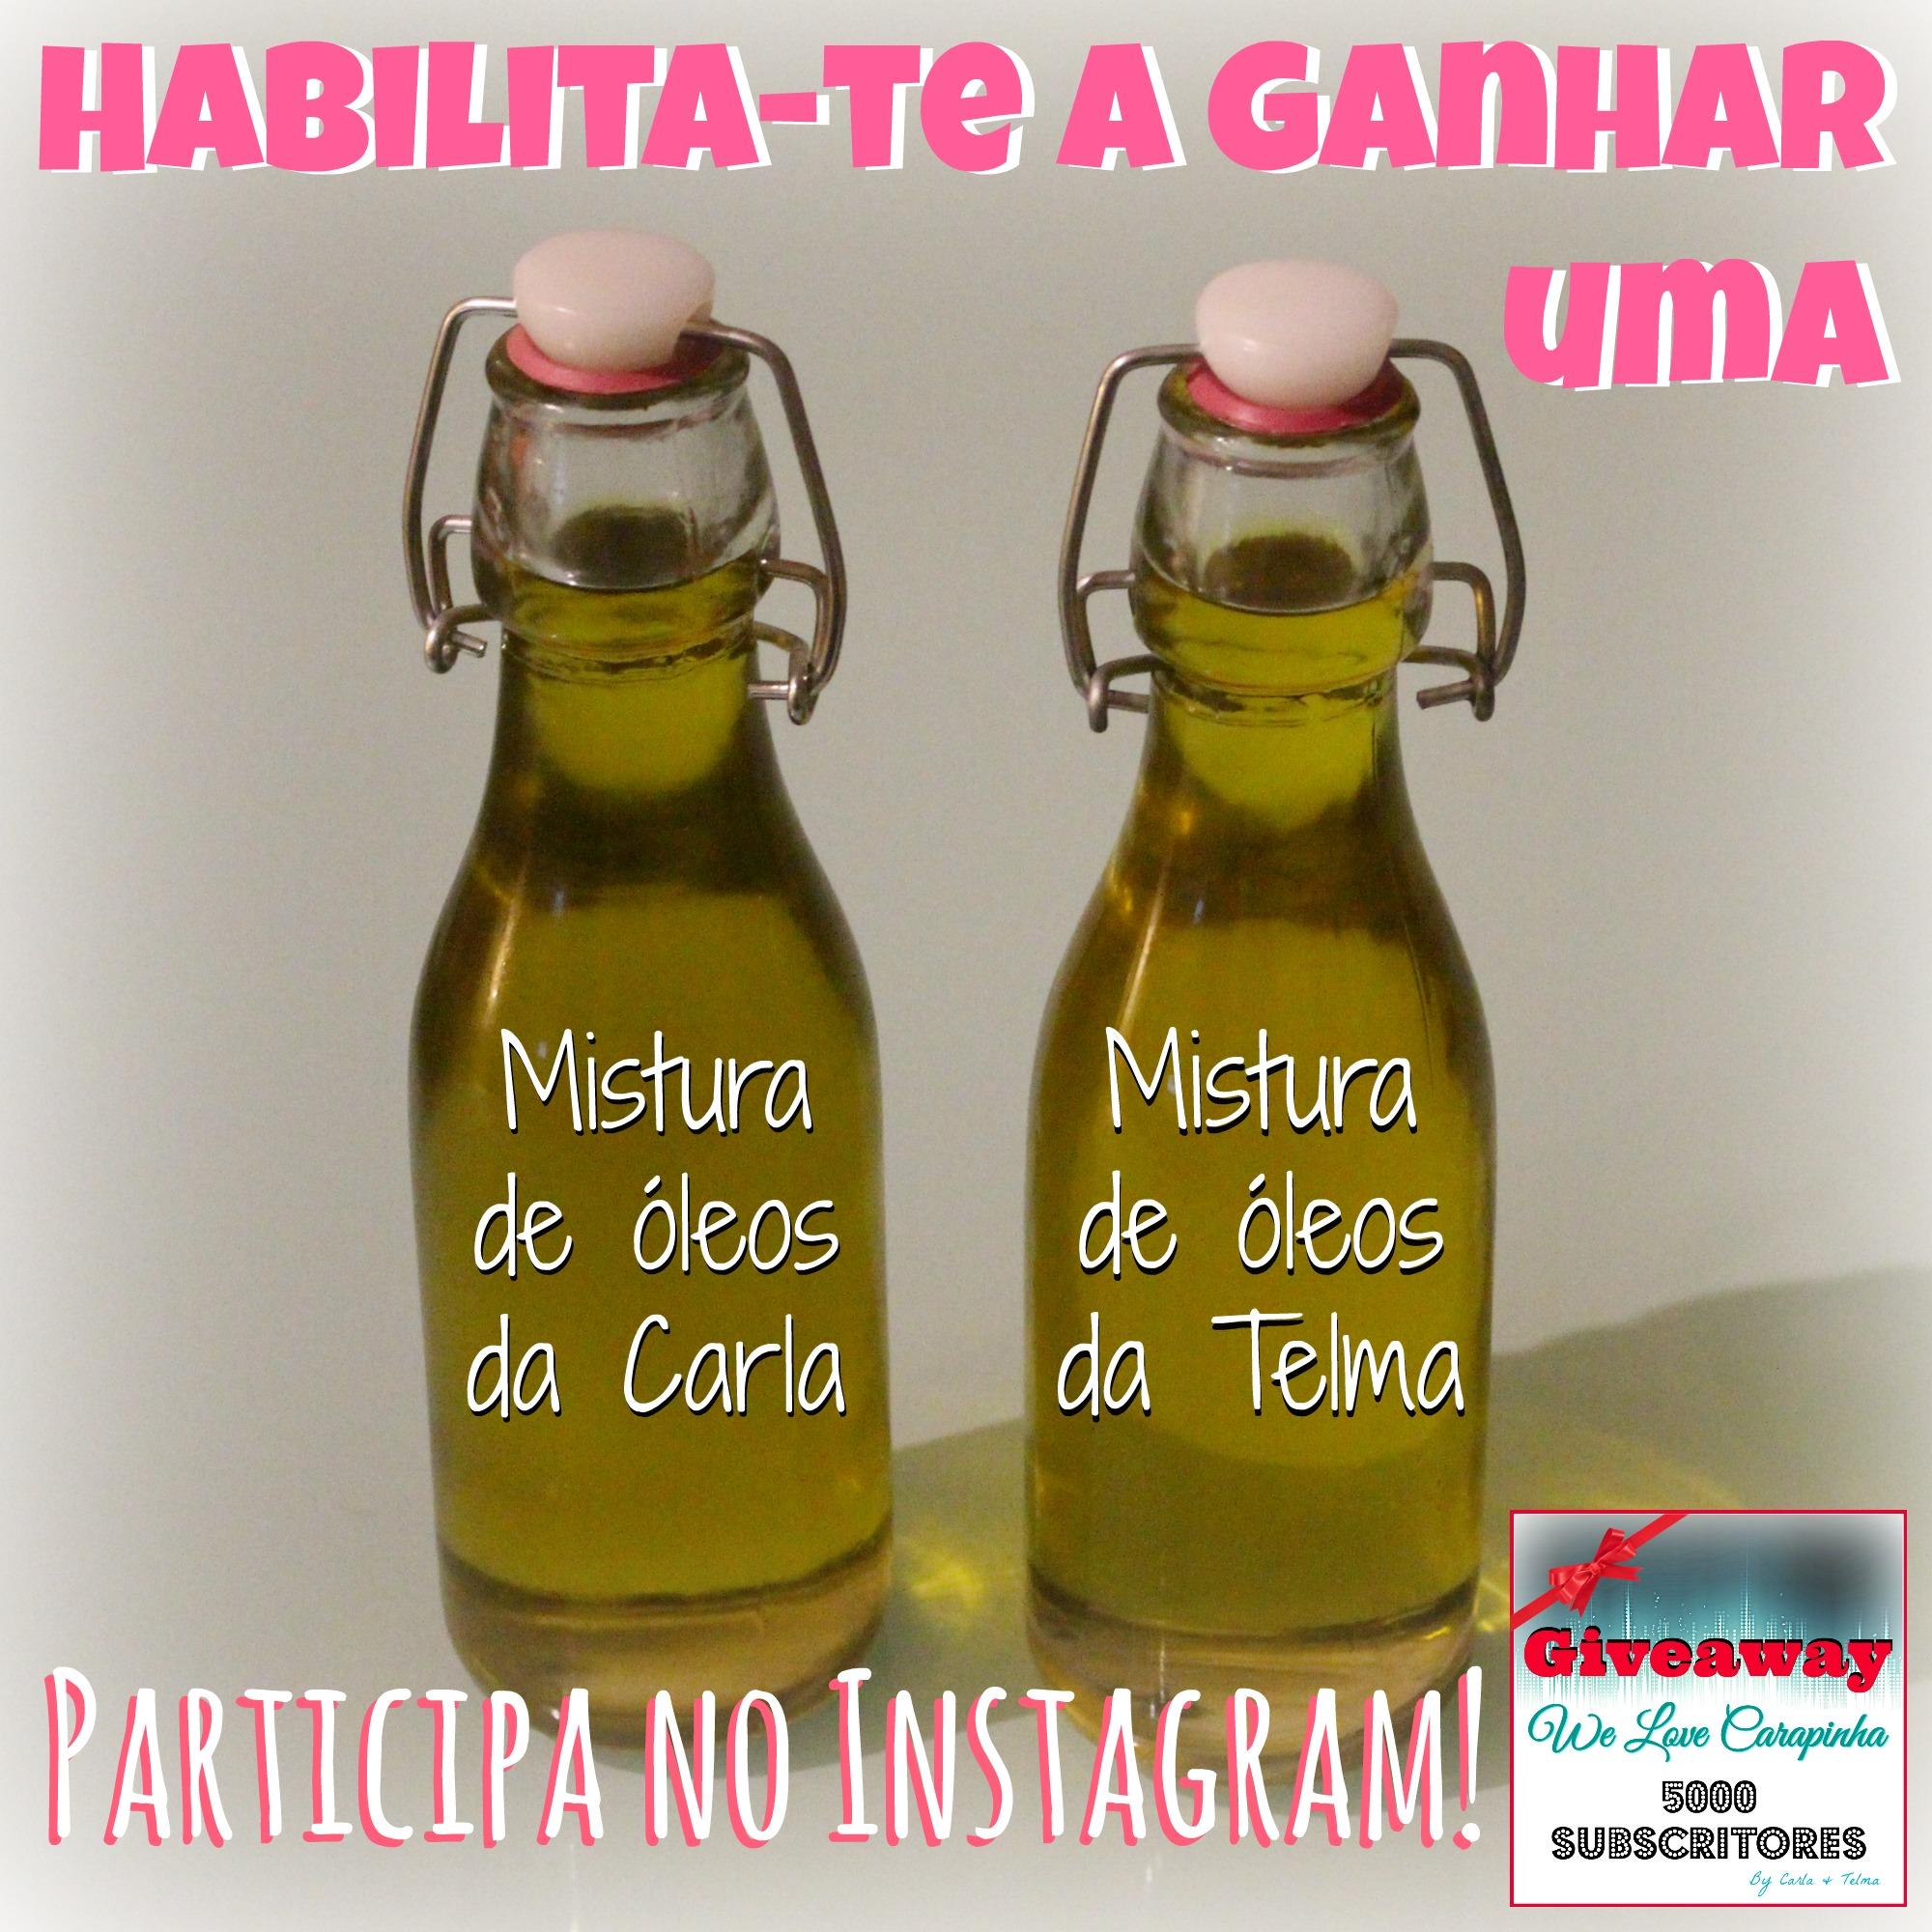 Prémio Instagram